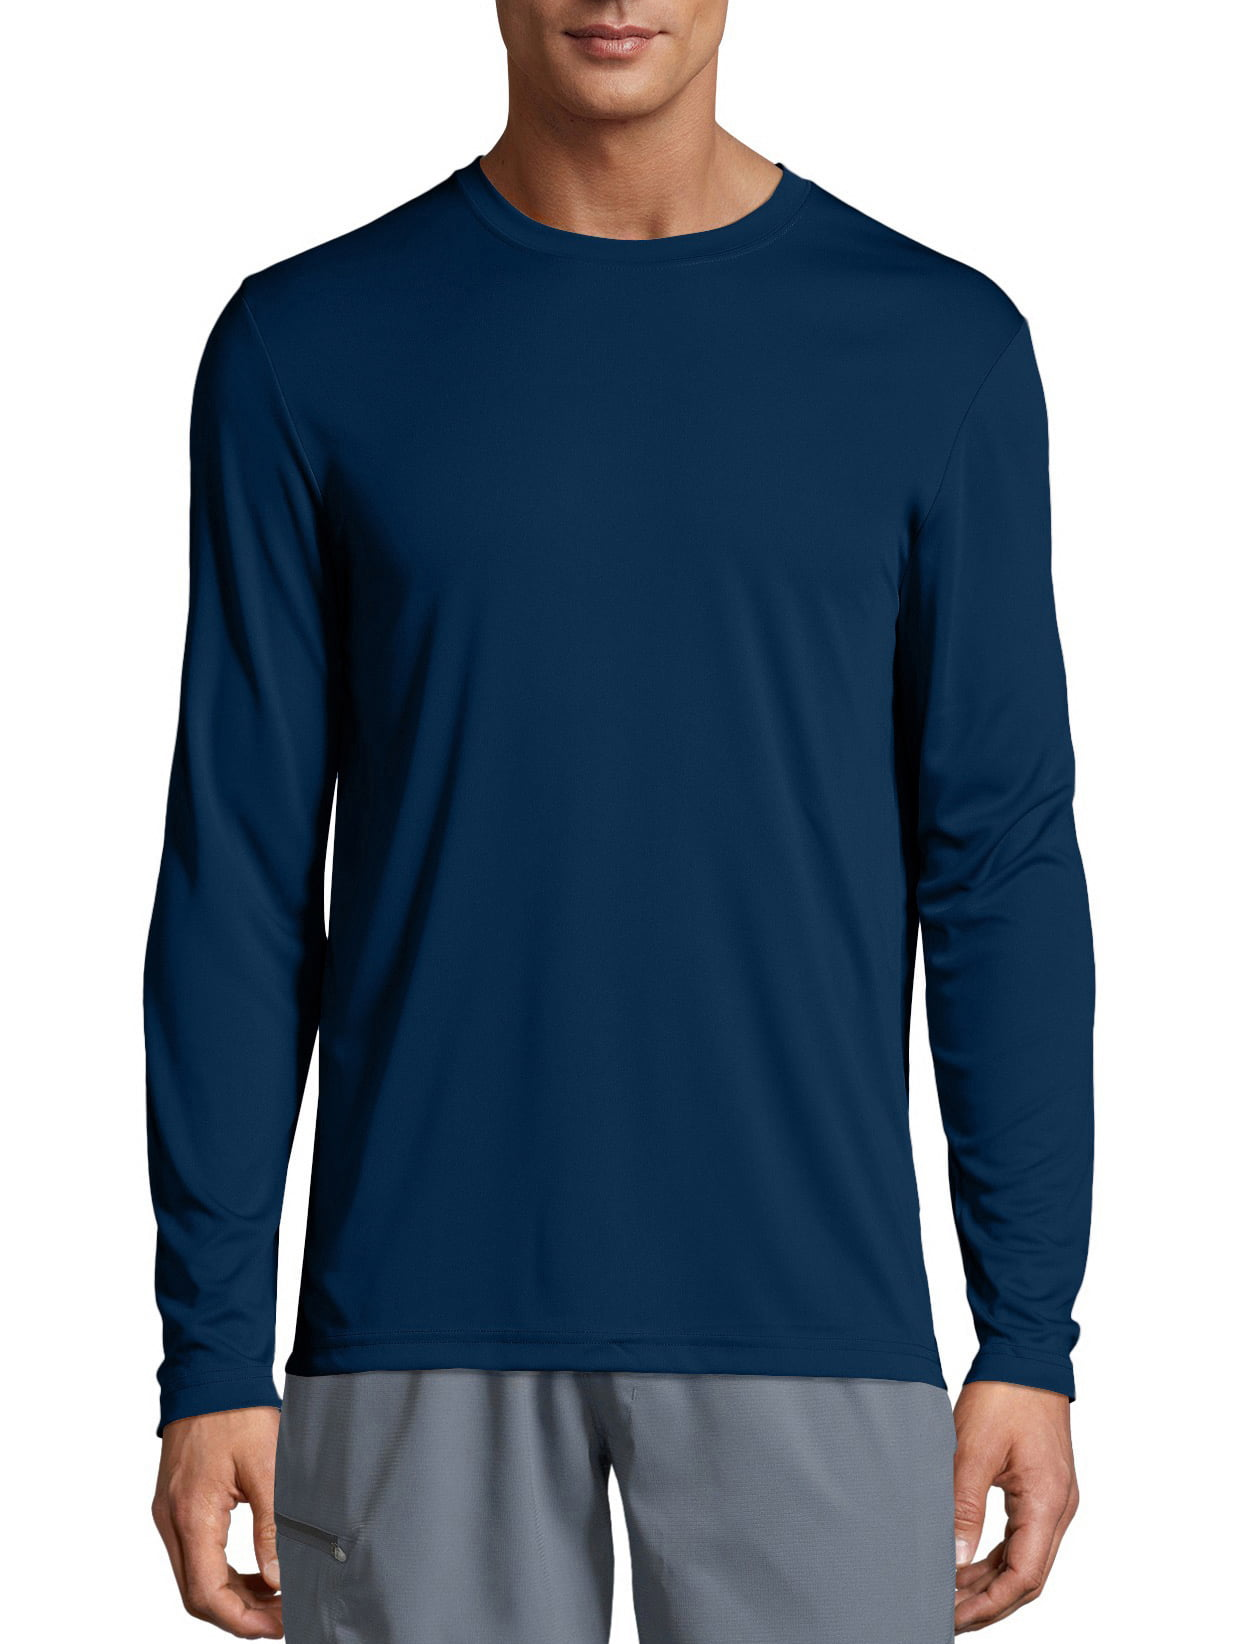 SKATE LIFE FLORAL SKATER RIDE AIR HIGH BEACH Mens Navy Long Sleeve T-Shirt